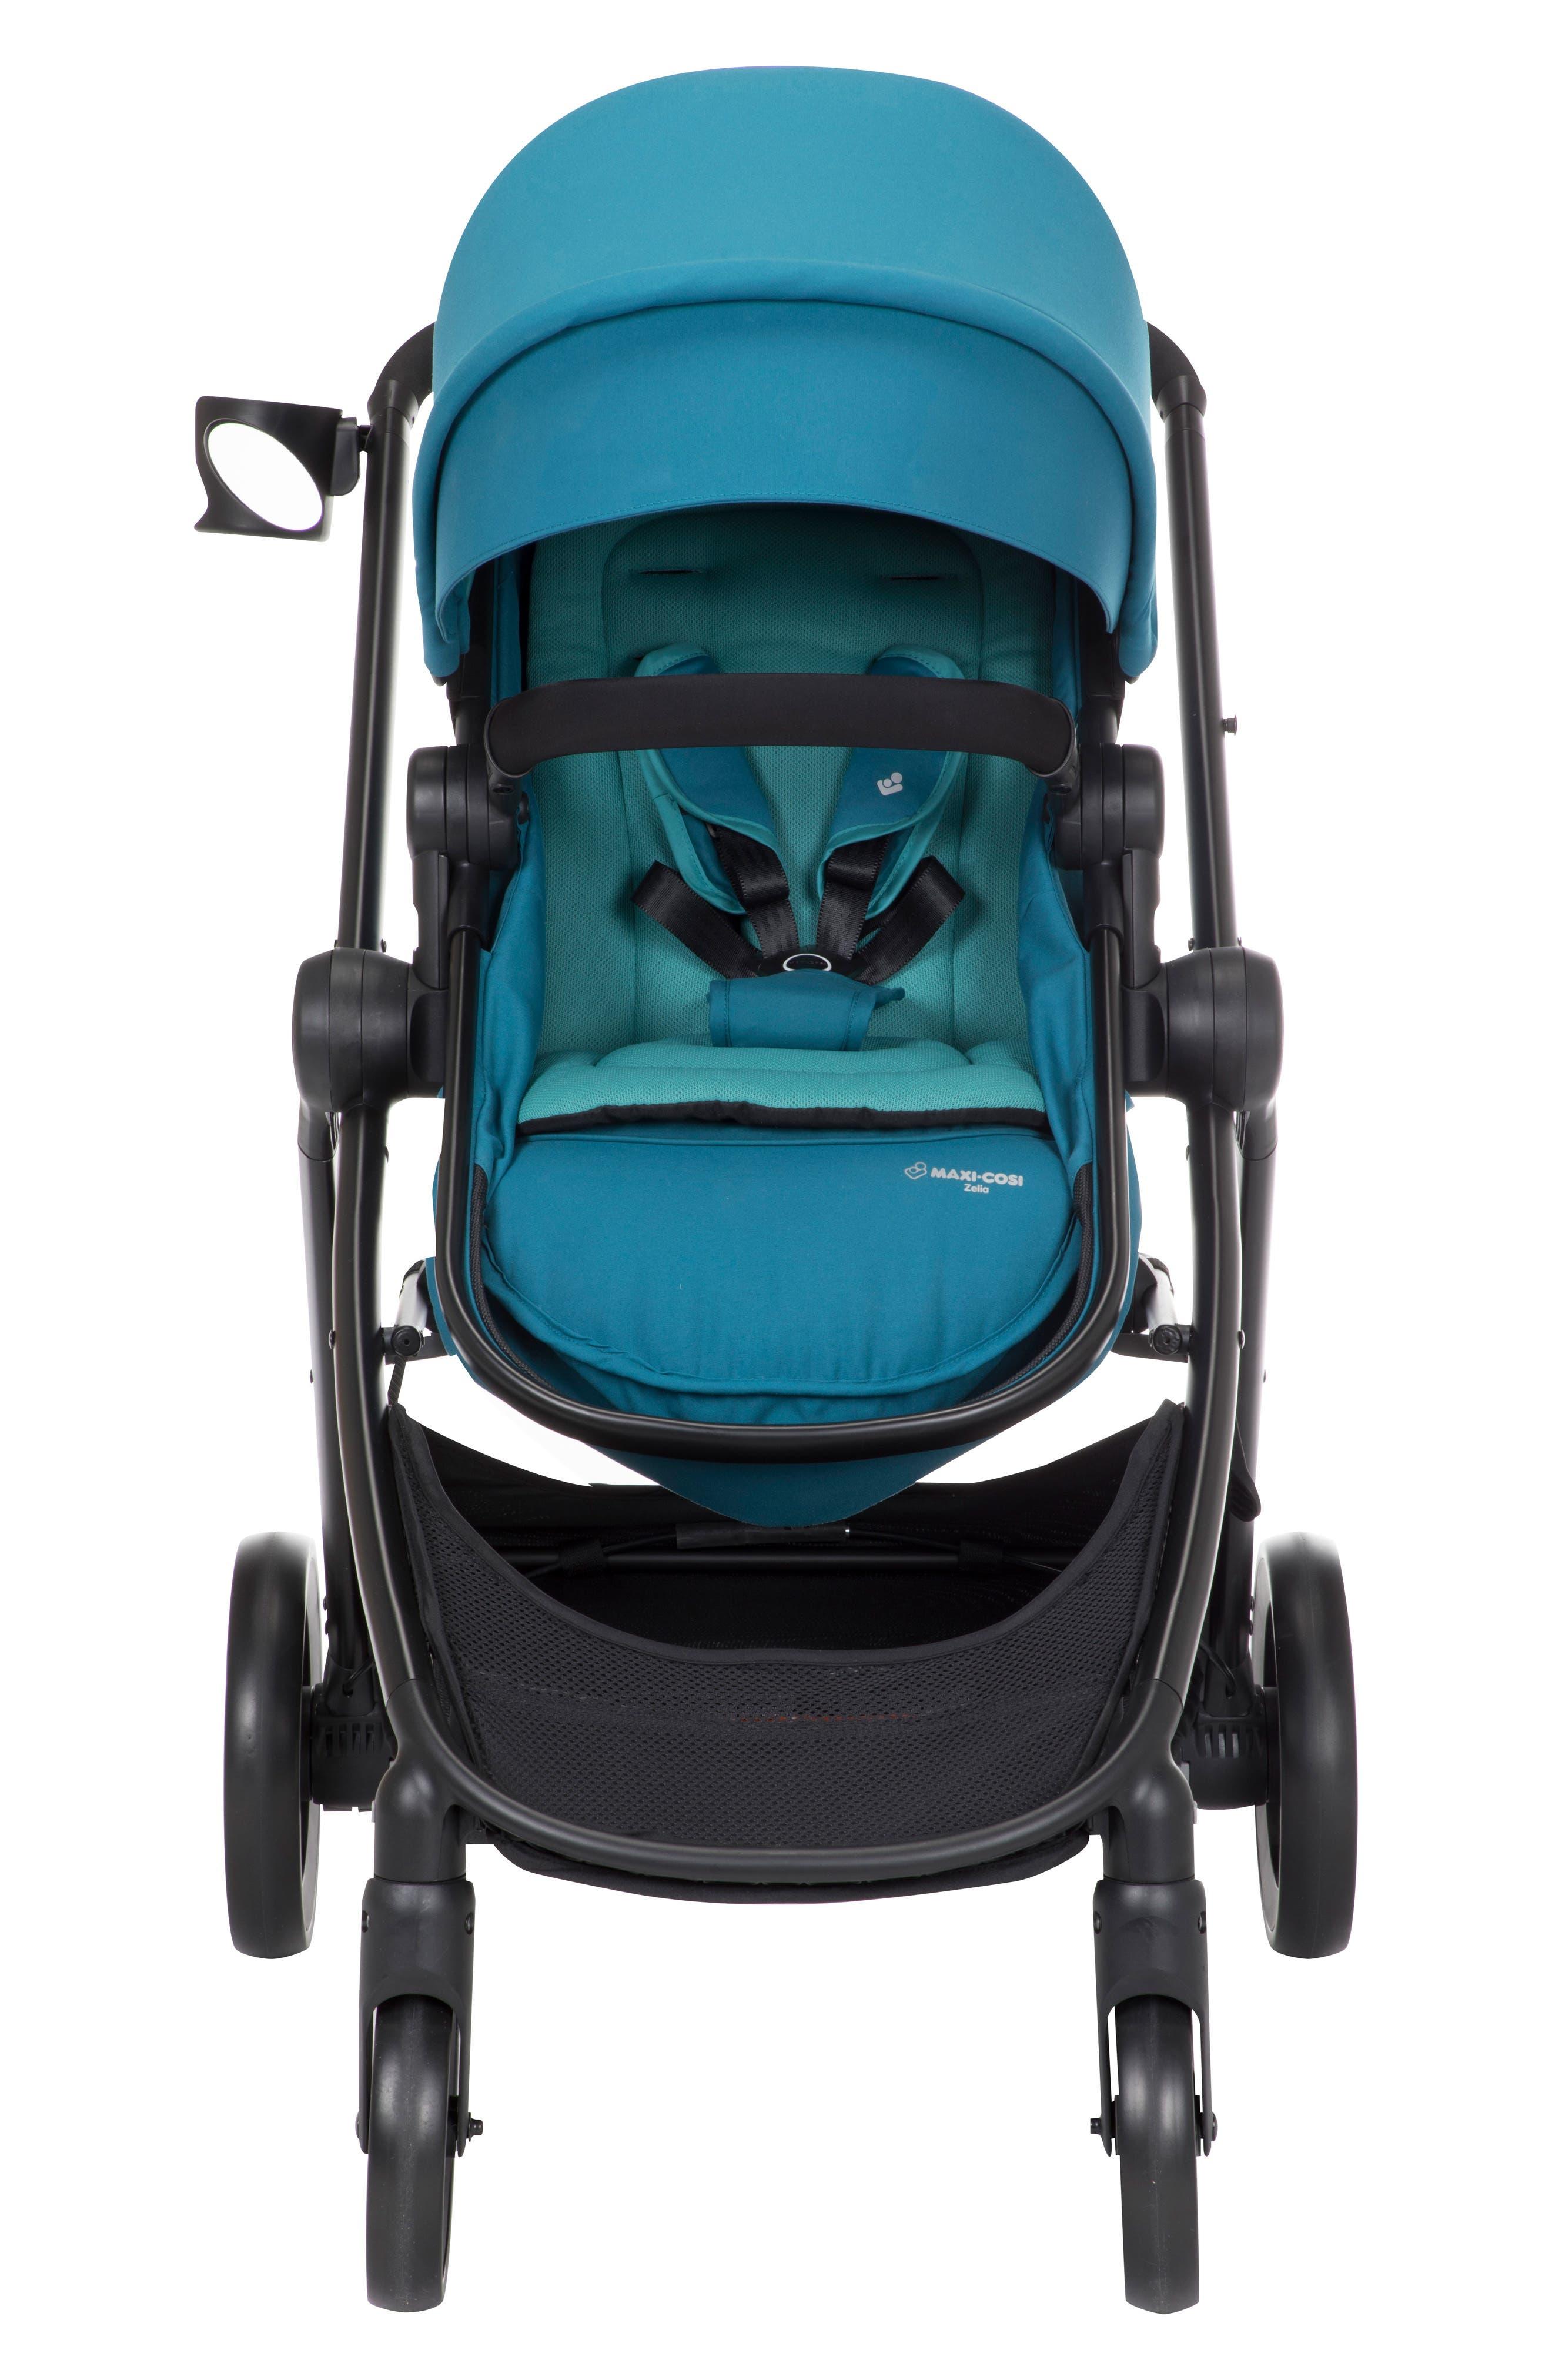 5-1 Mico 30 Infant Car Seat & Zelia Stroller Modular Travel System,                         Main,                         color, EMERALD TIDE